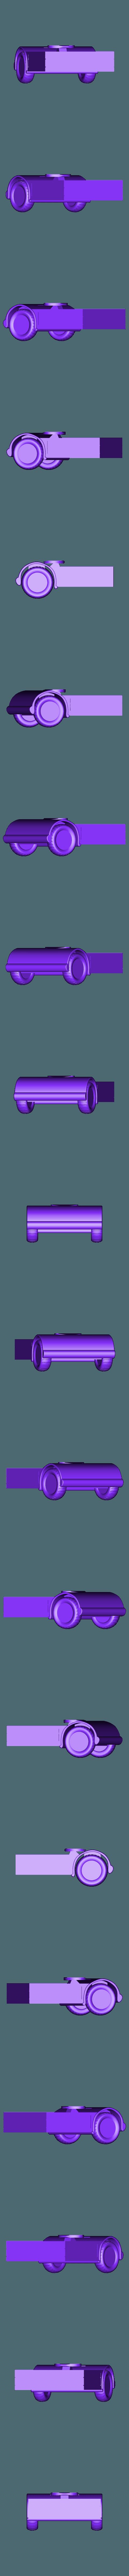 partie 2.stl Download free STL file lorry • 3D printable design, david39